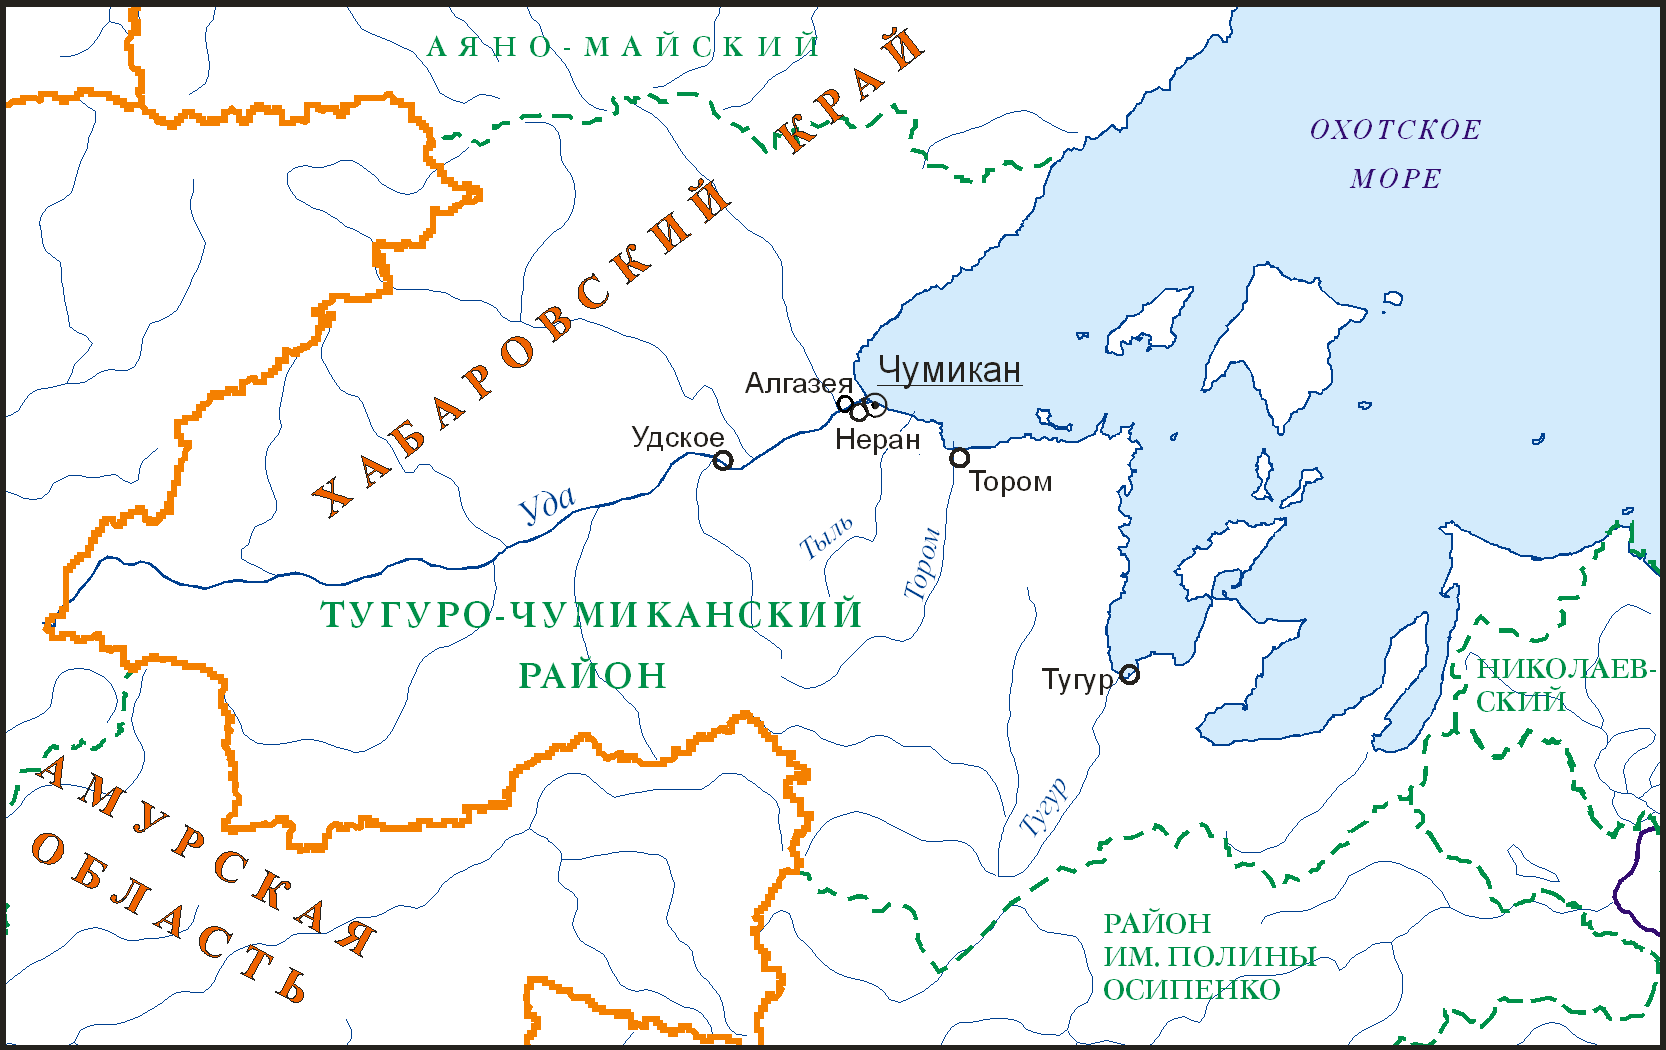 Тугуро-Чумиканский район